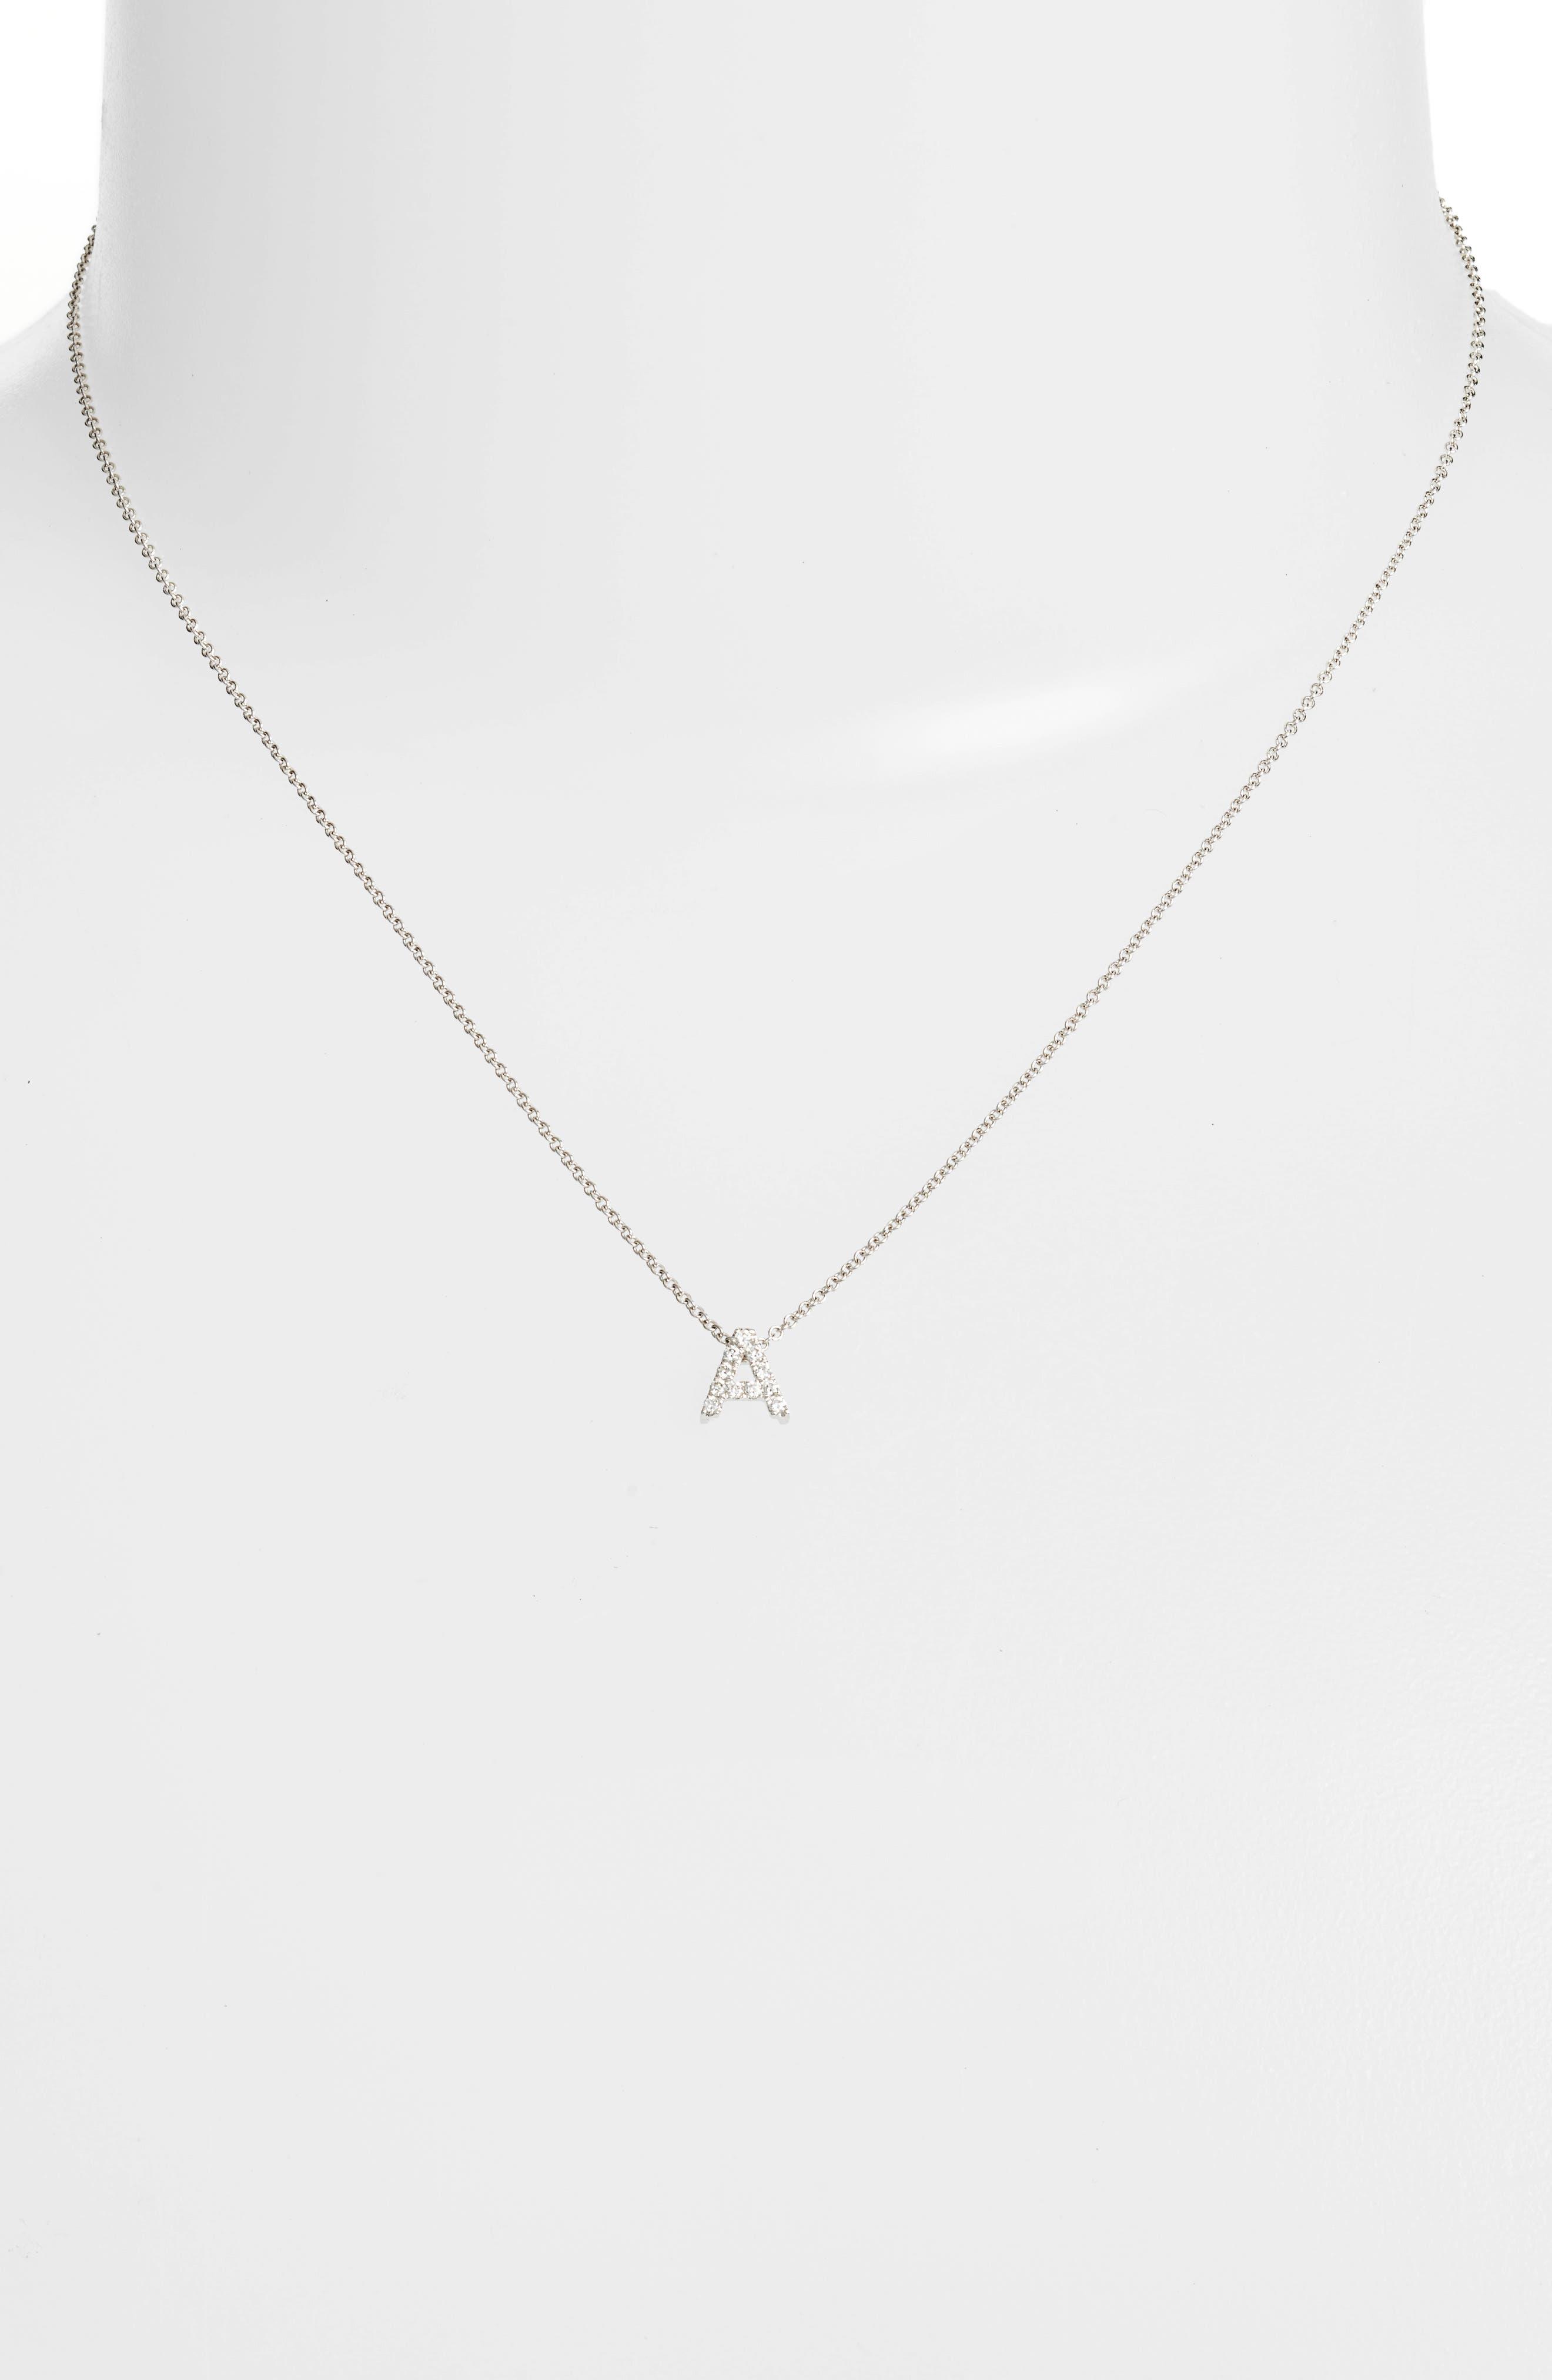 BONY LEVY, 18k Gold Pavé Diamond Initial Pendant Necklace, Alternate thumbnail 3, color, WHITE GOLD - A